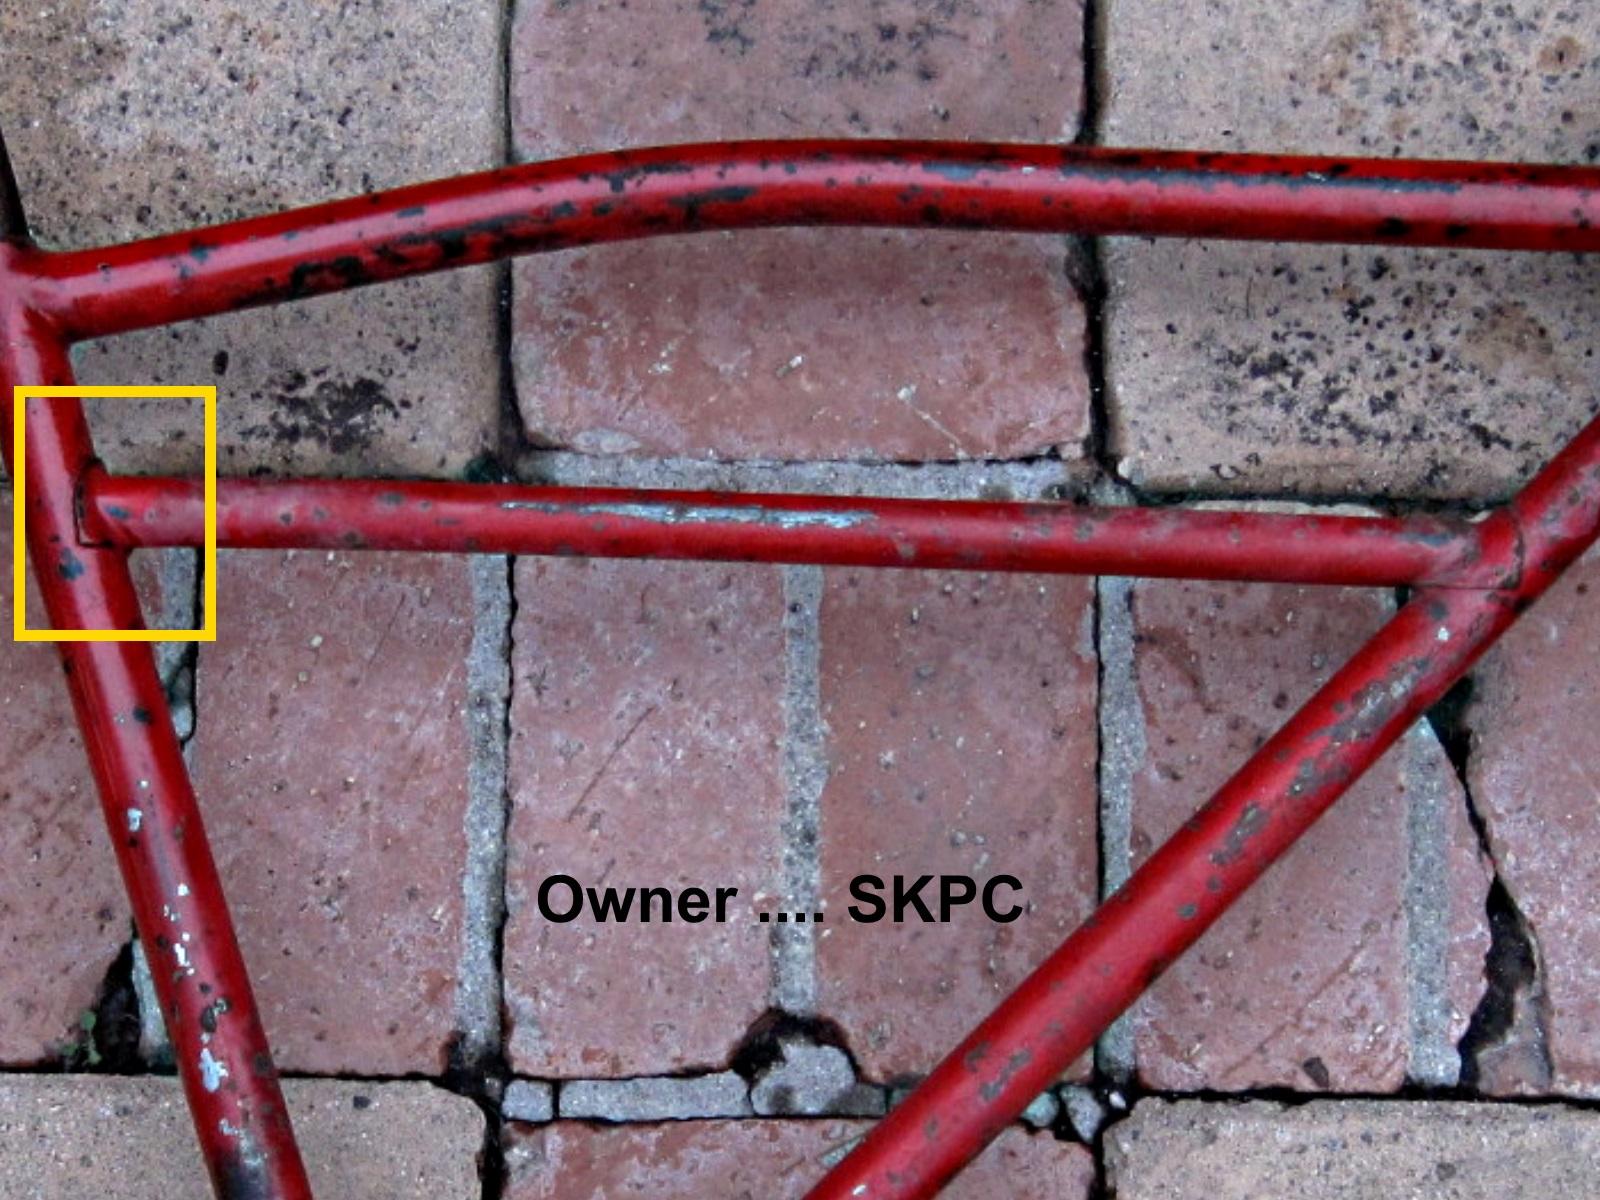 IMG_1874 SKPC MOTORBIKE.jpg